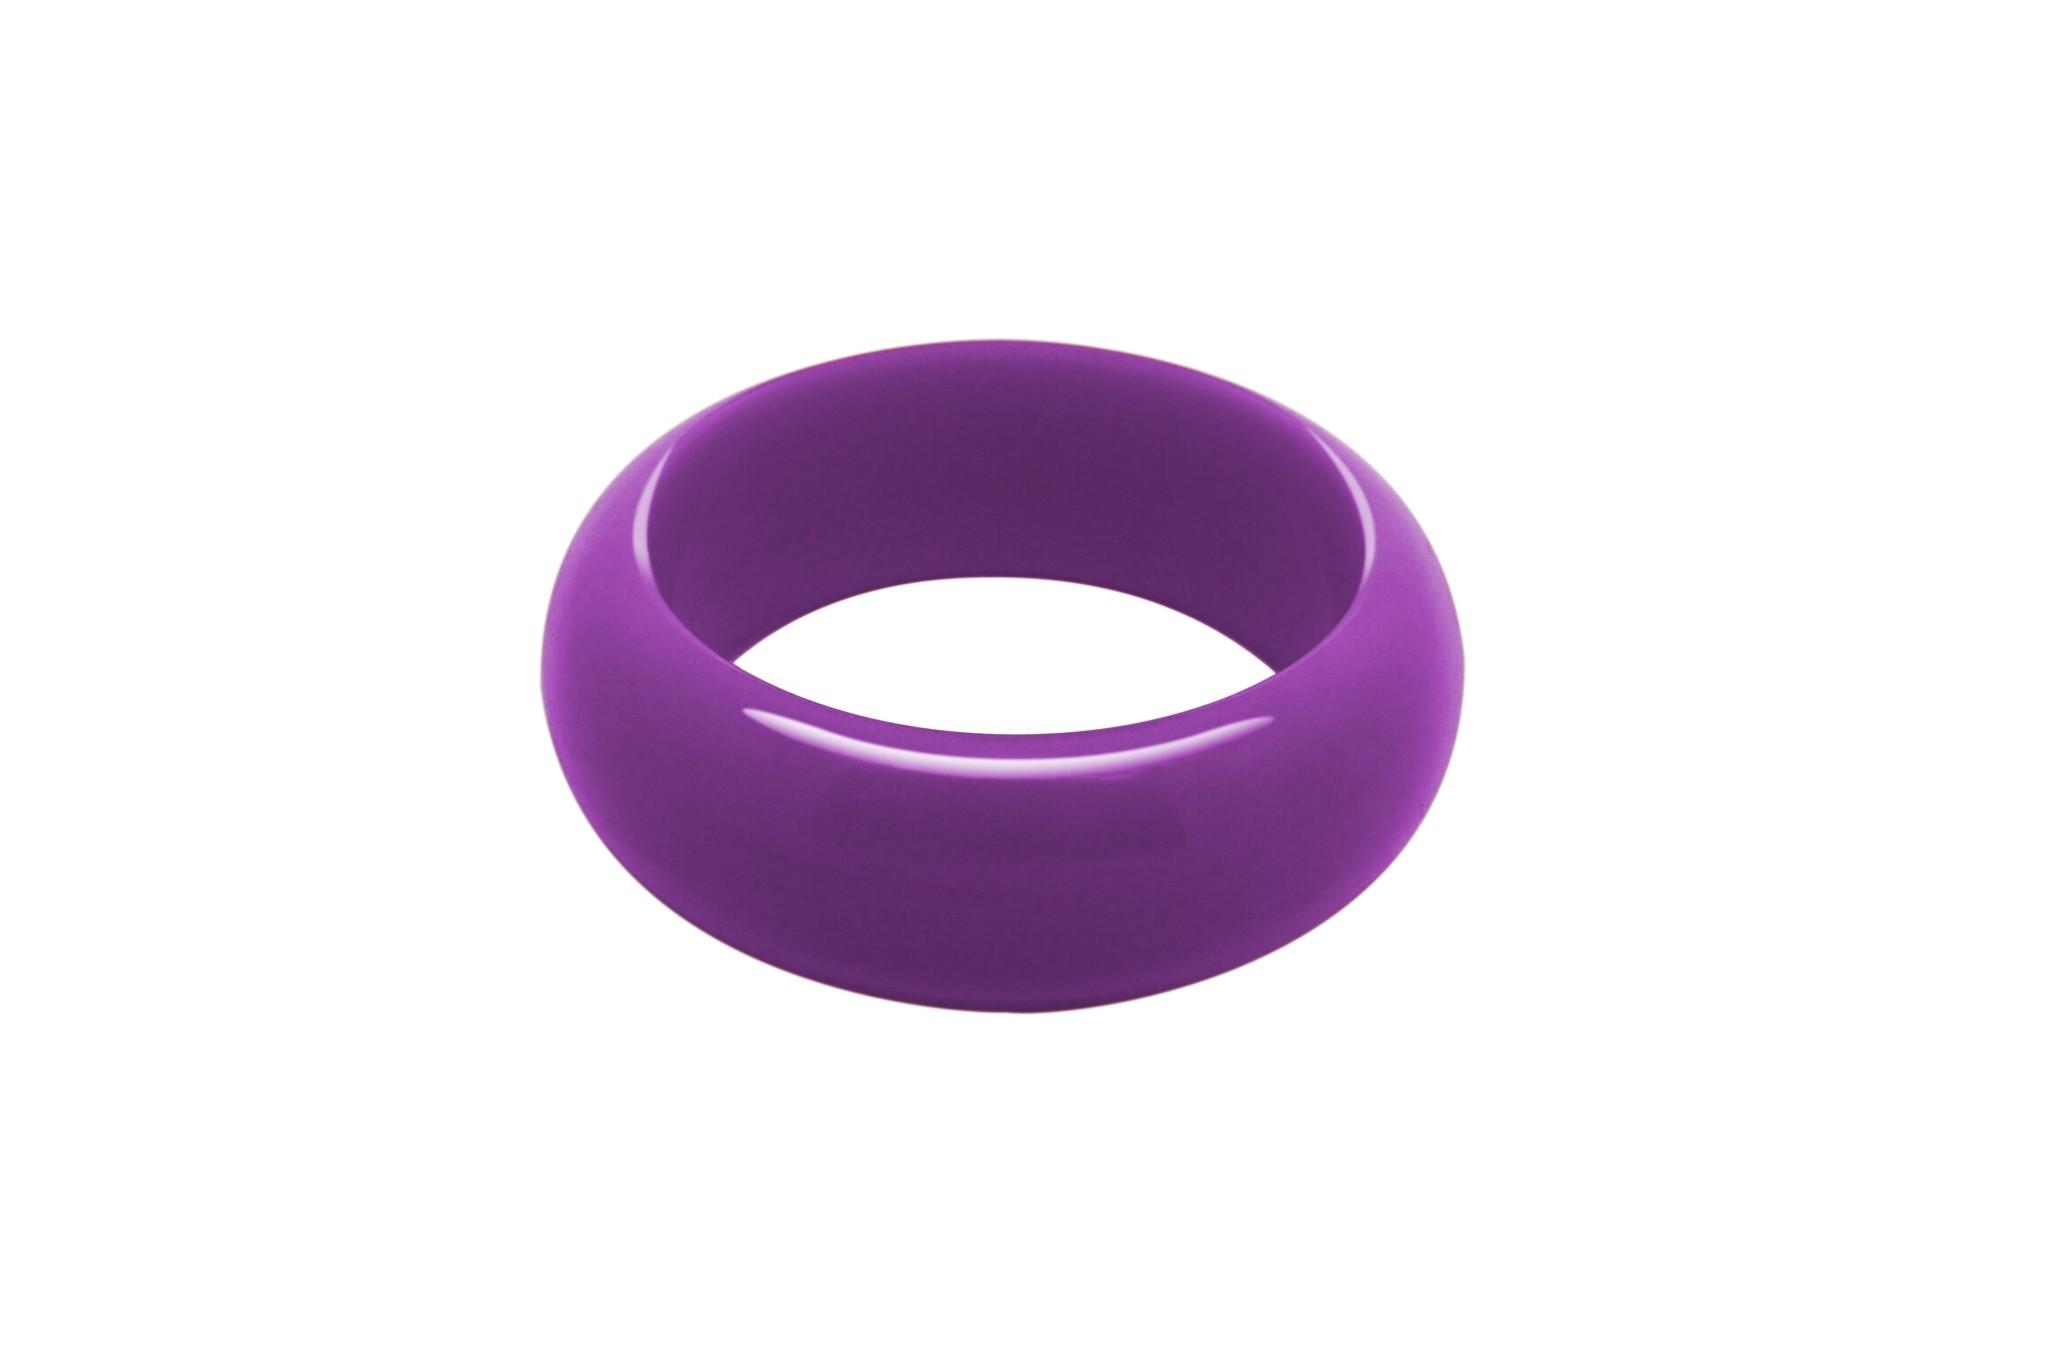 Jellystone Designs armband Purple Grape